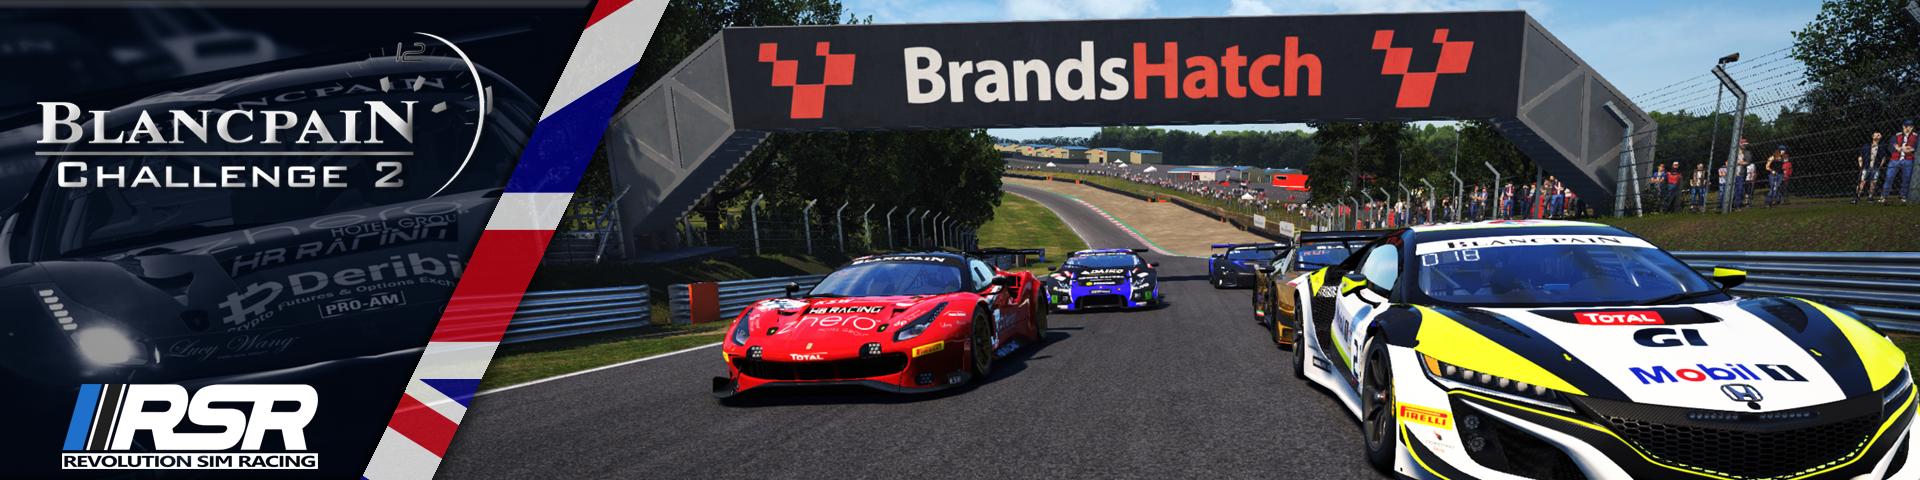 R1 - Brands Hatch.png